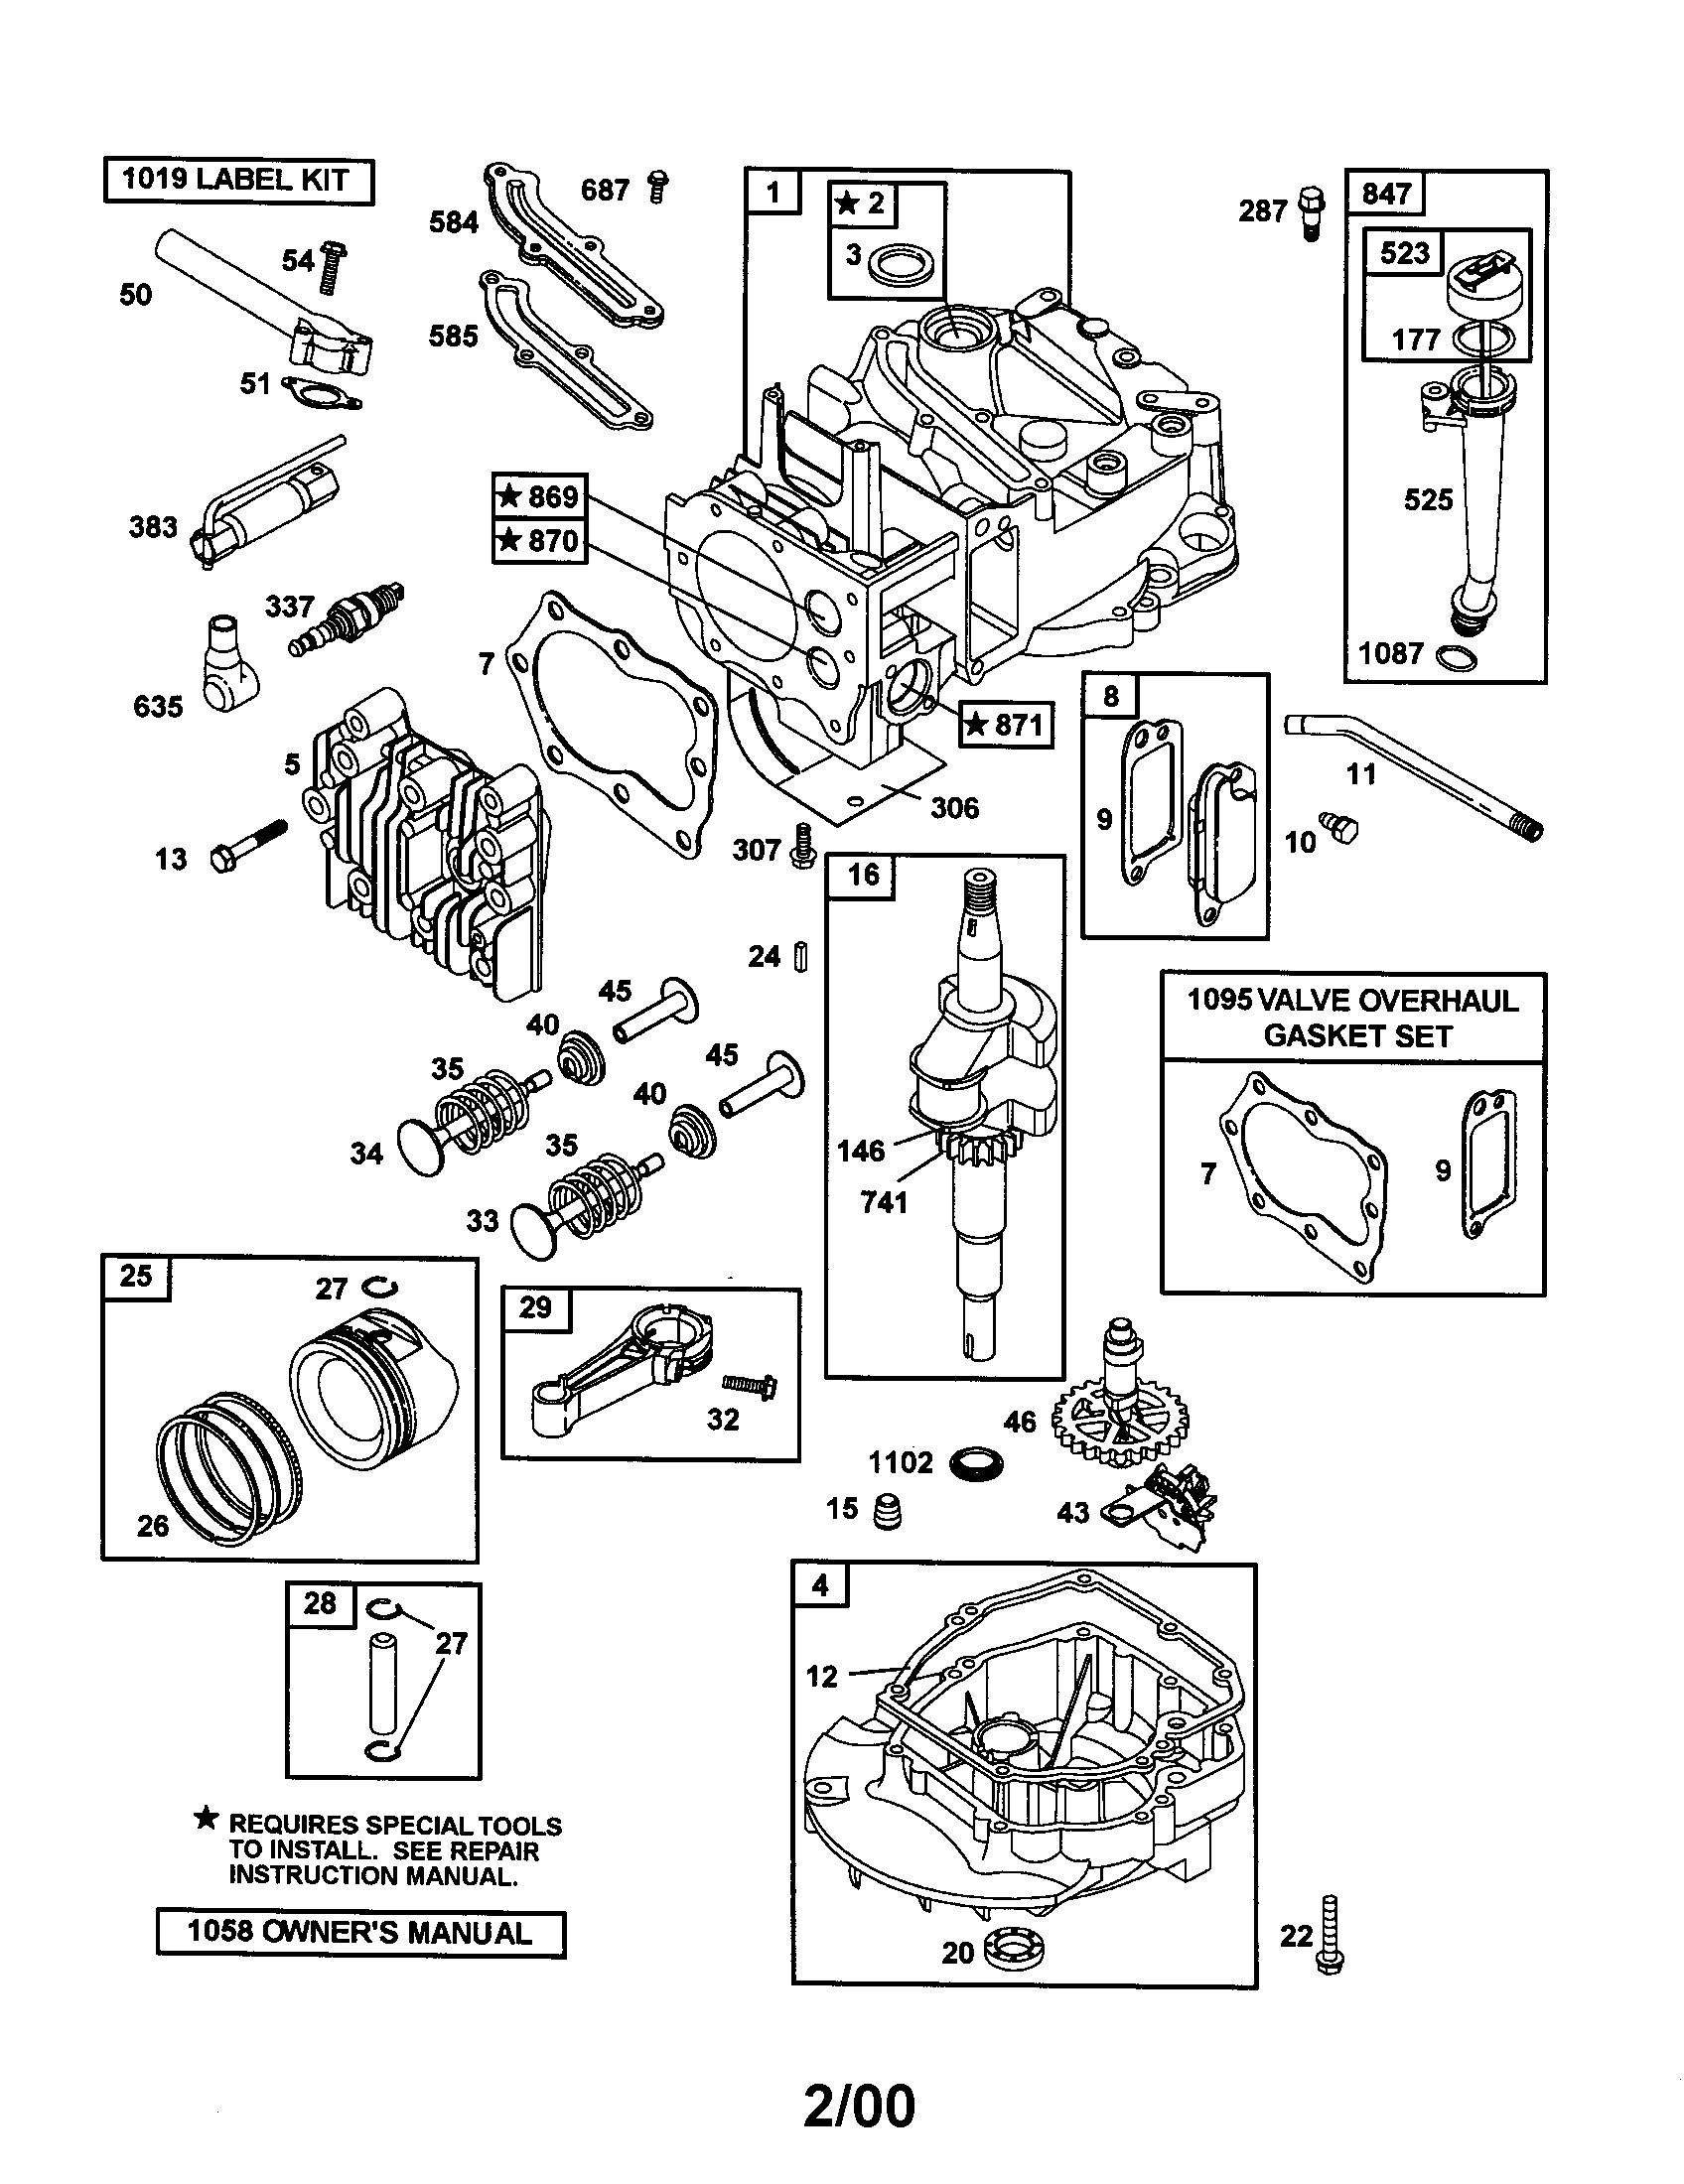 Briggs And Stratton 20 Hp Intek Wiring Diagram